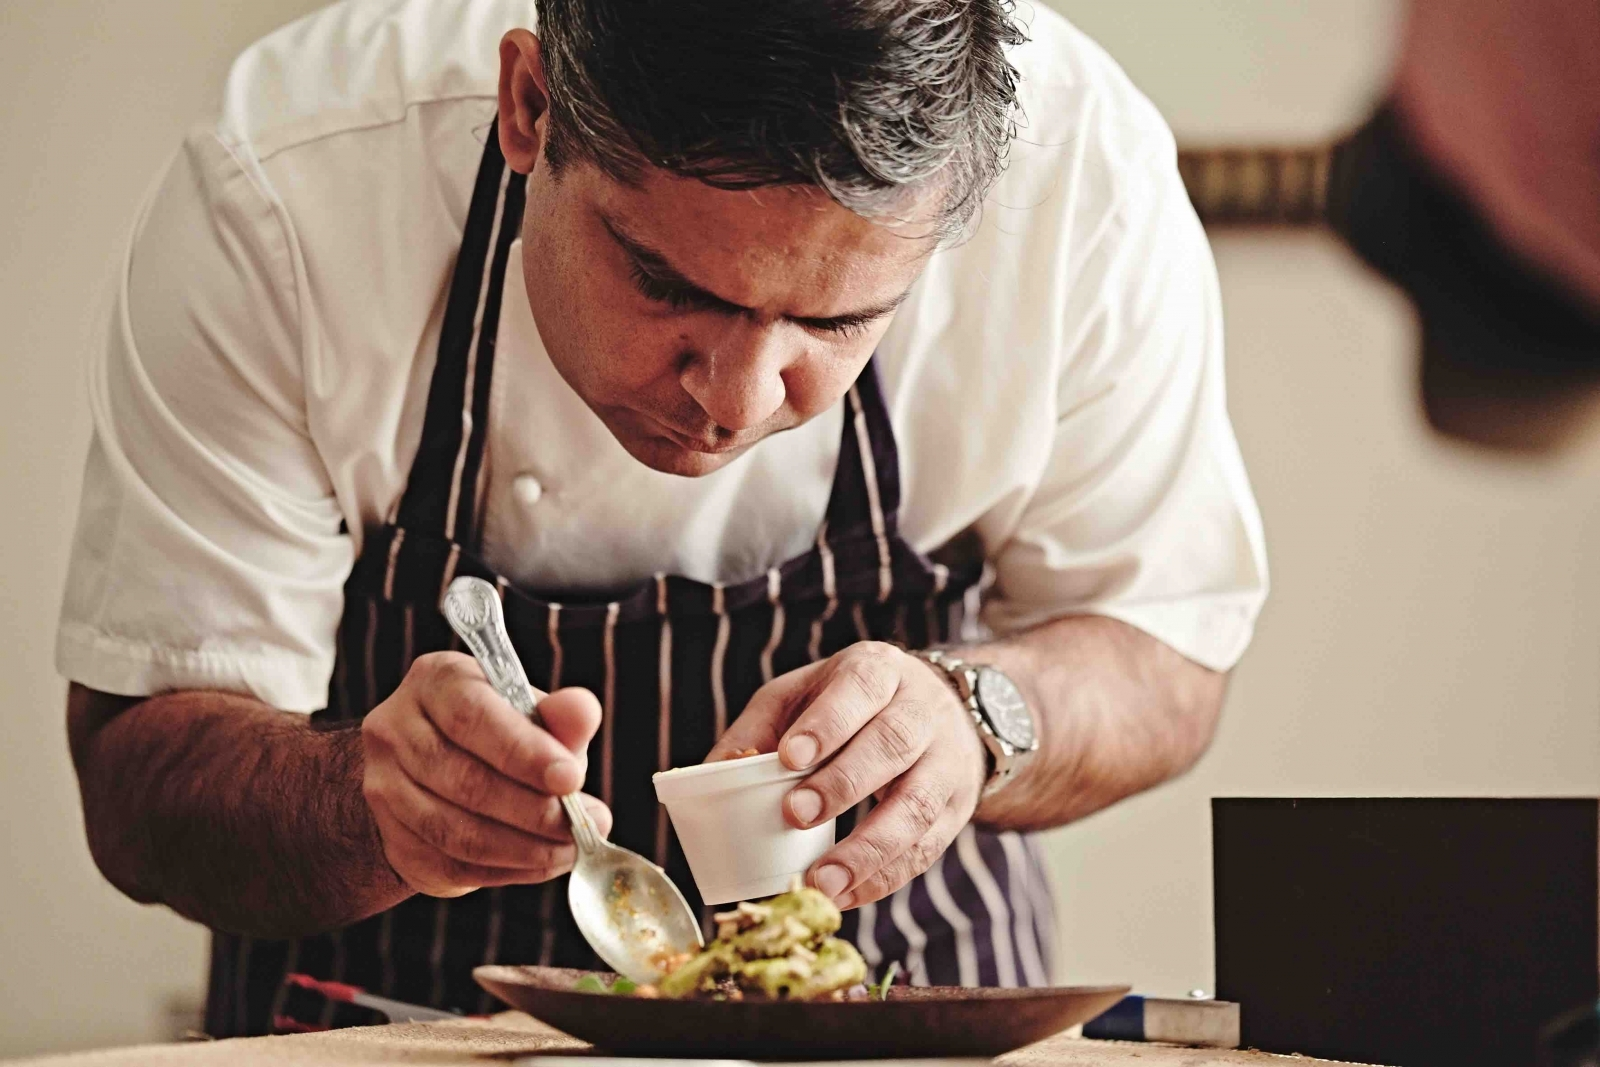 Indian chef, Vivek Singh